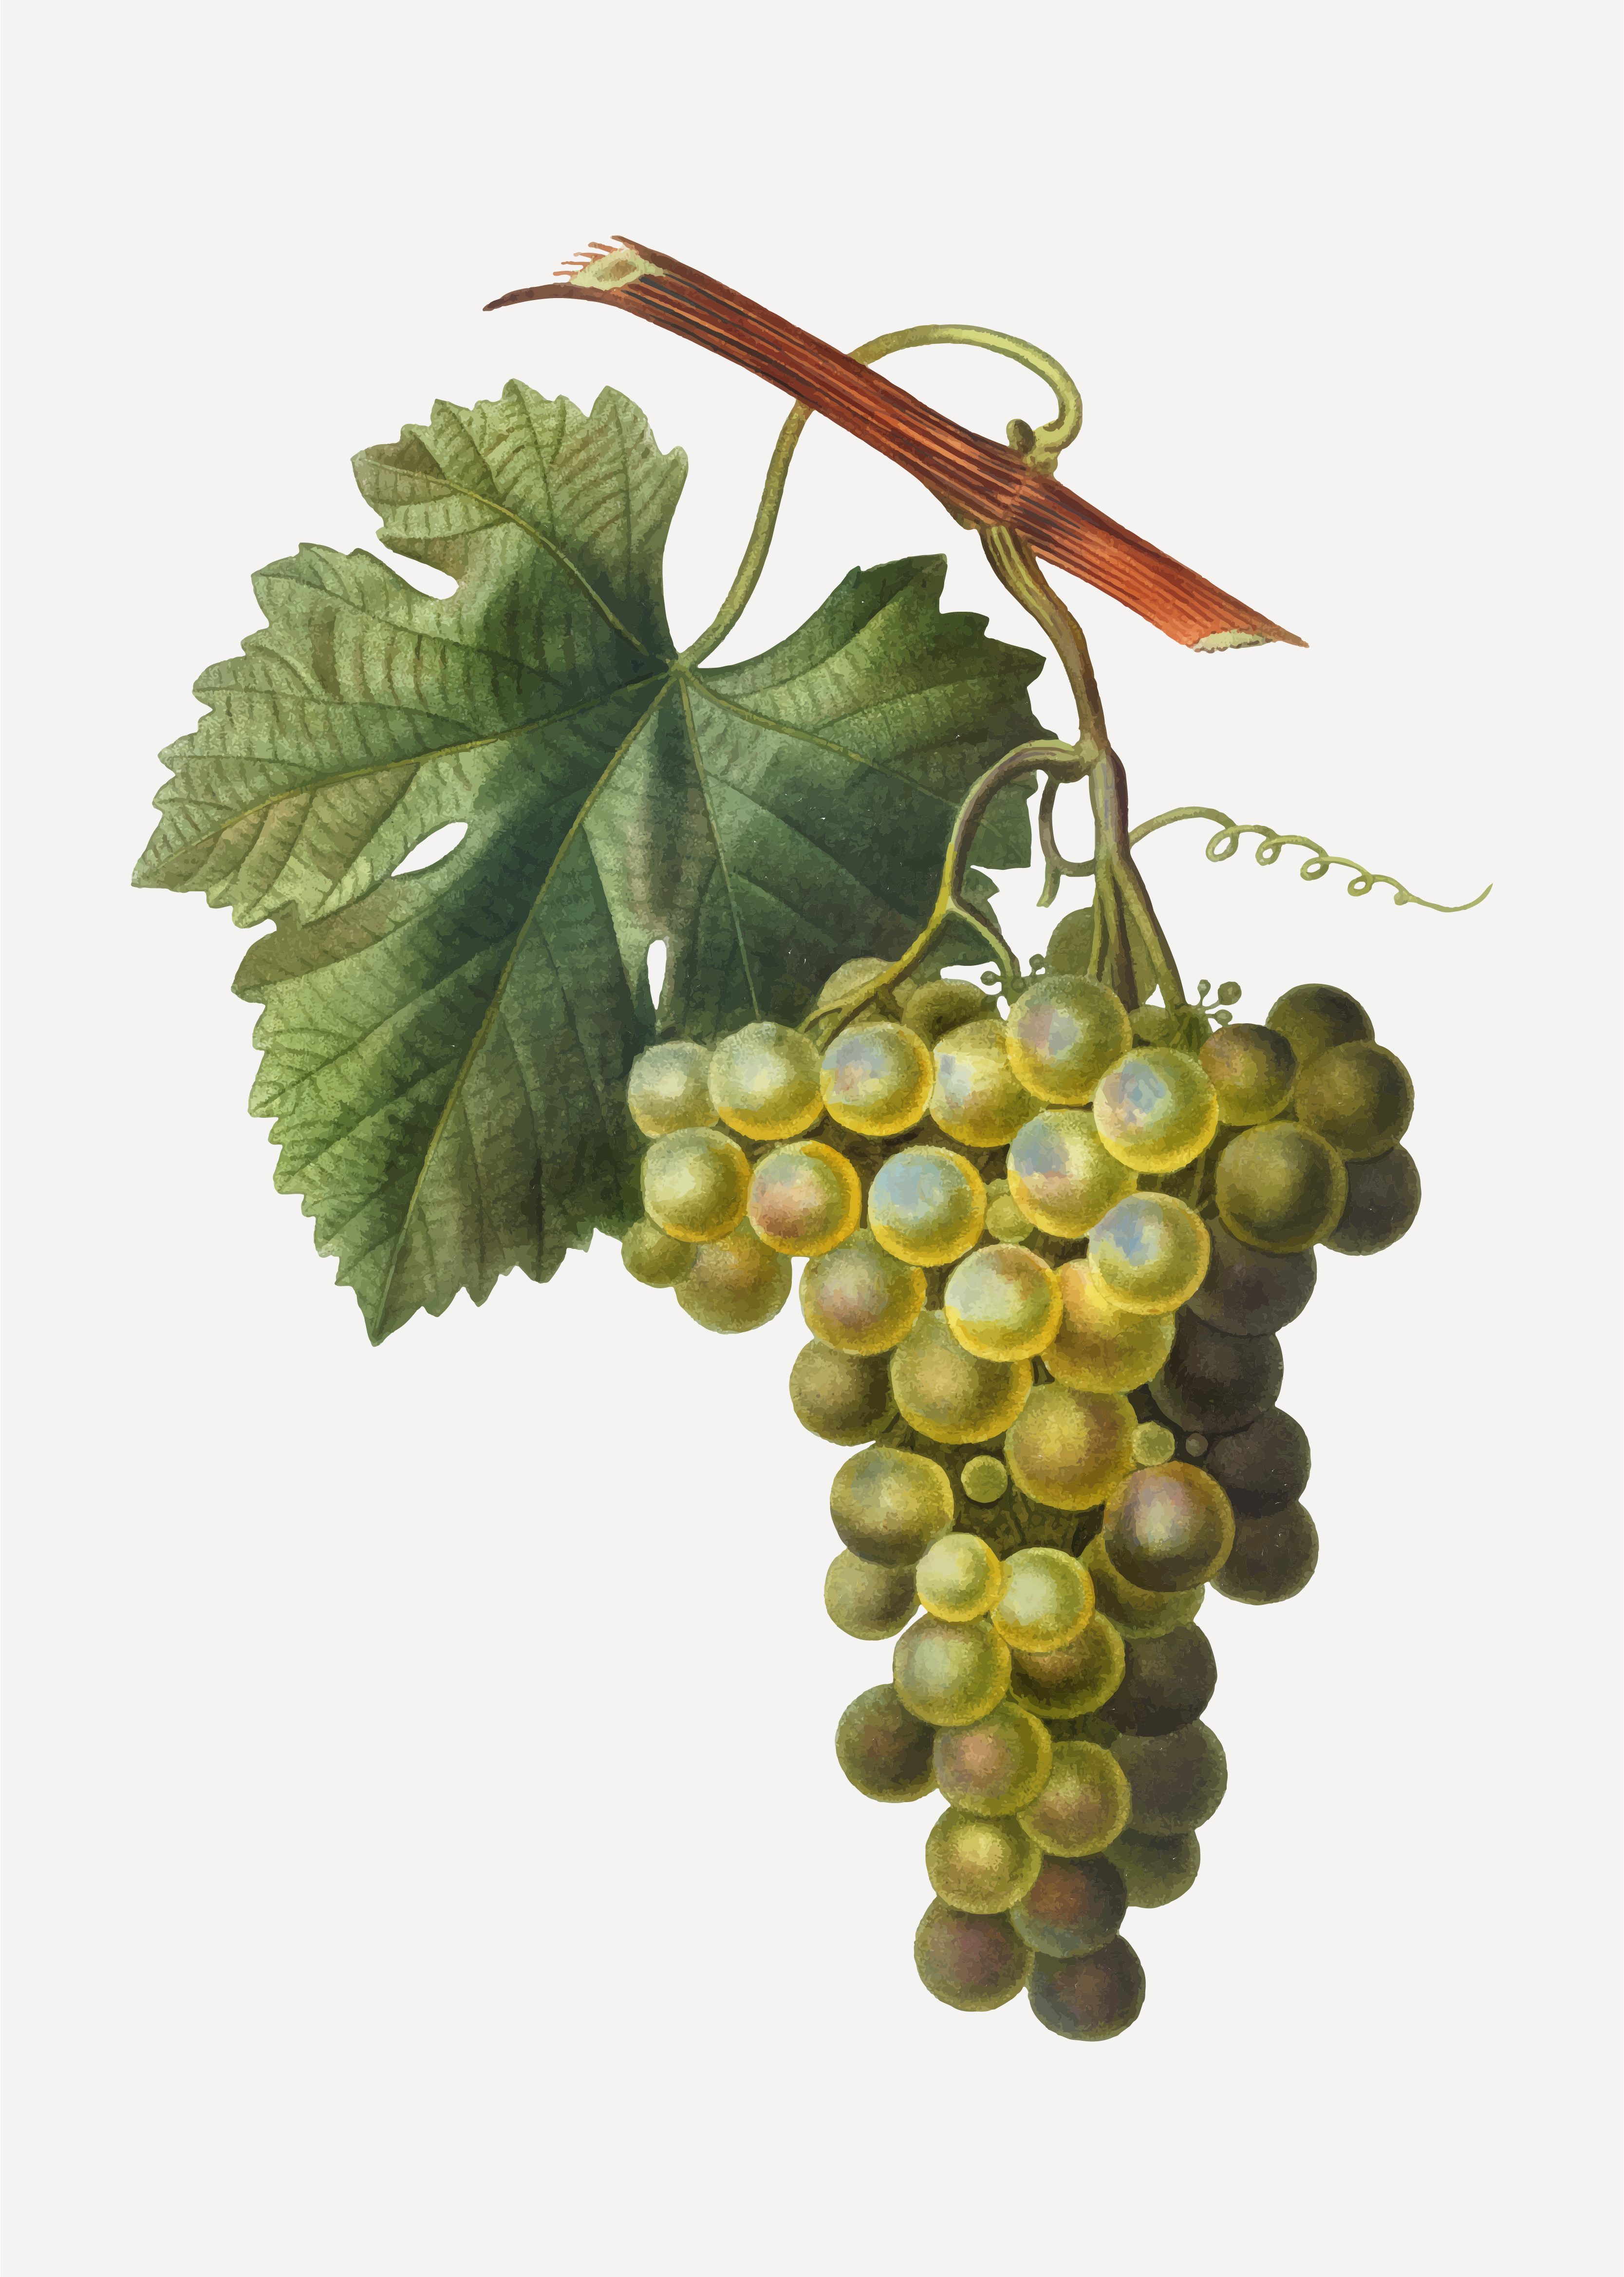 Green Grape Cluster Download Free Vectors Clipart